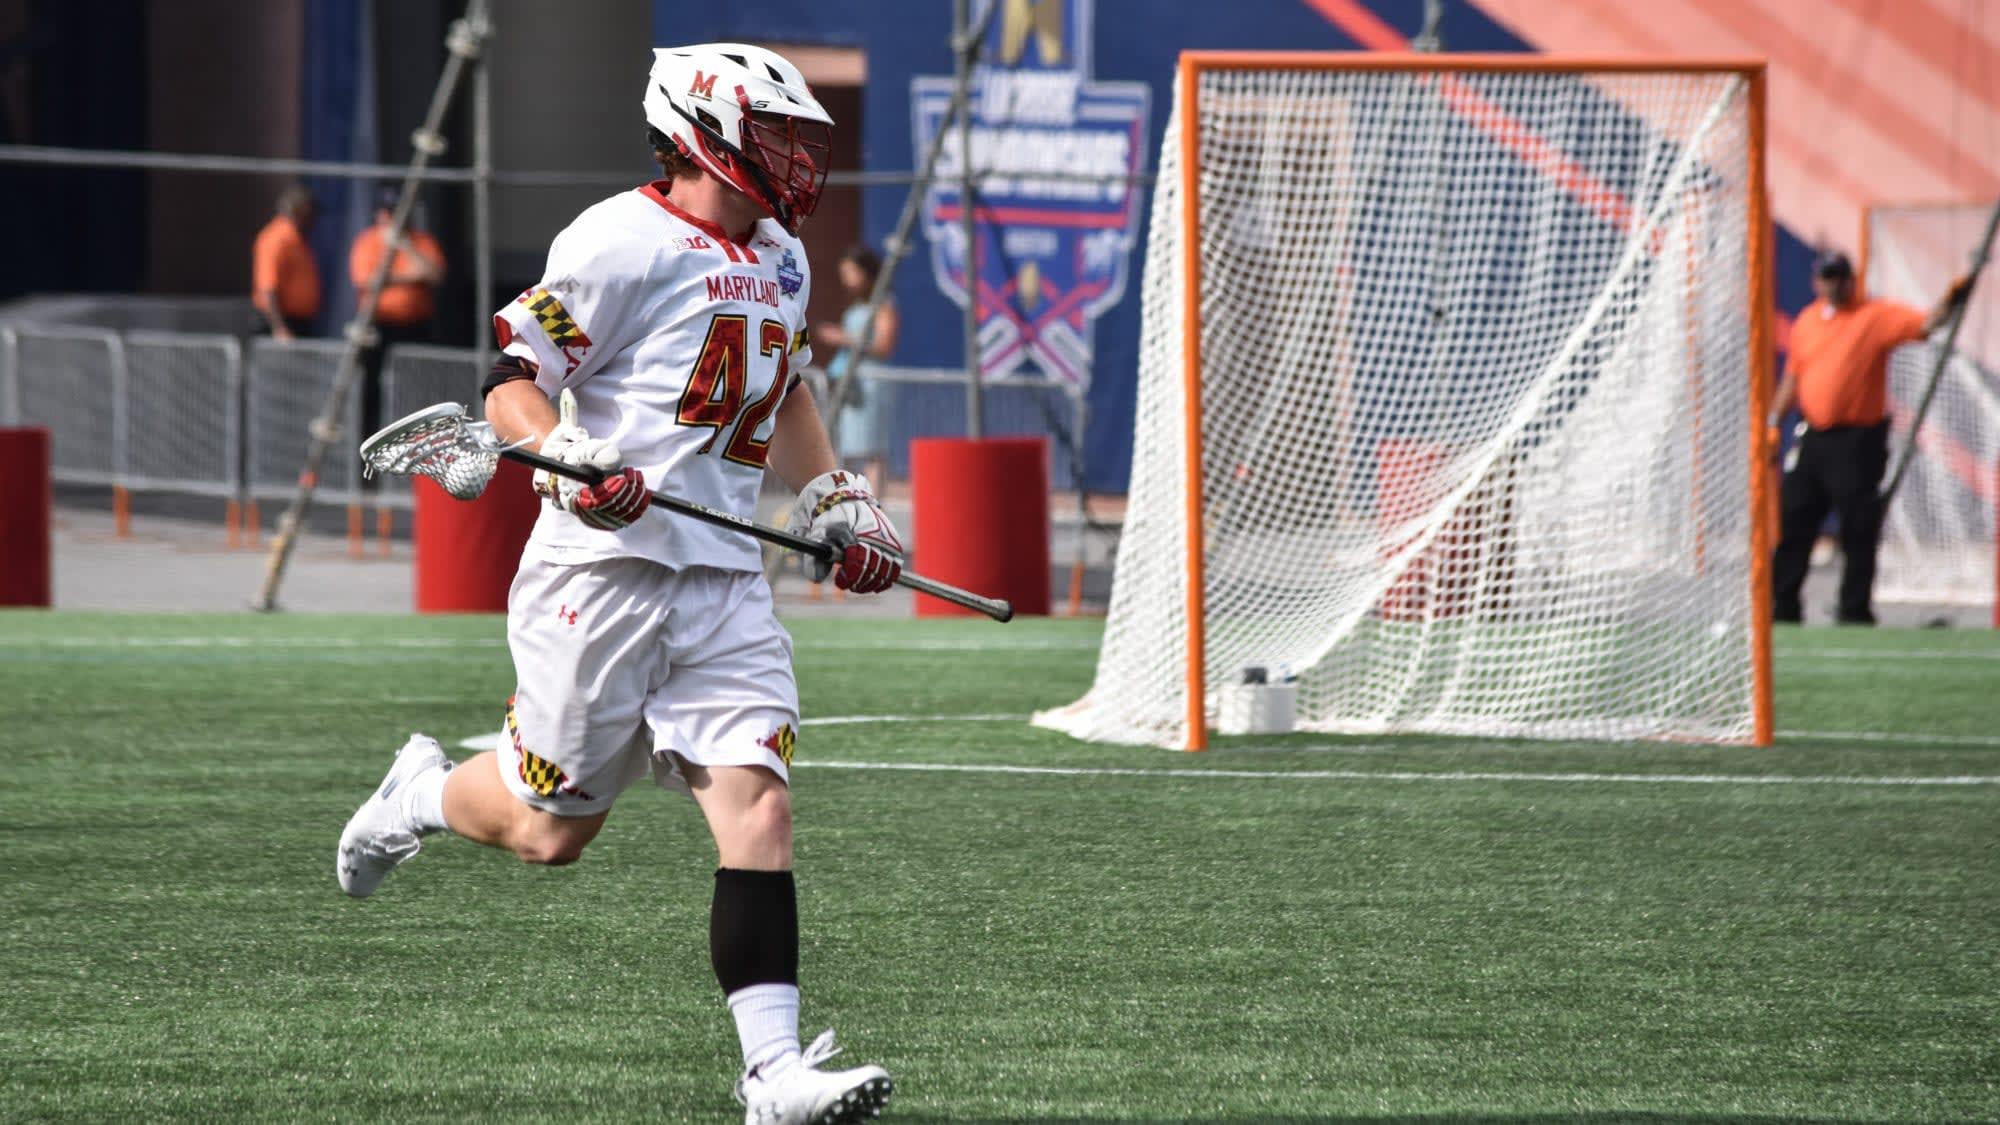 Duke vs Maryland 2018 NCAA Semifinals Ryan Conwell inside lacrosse media poll